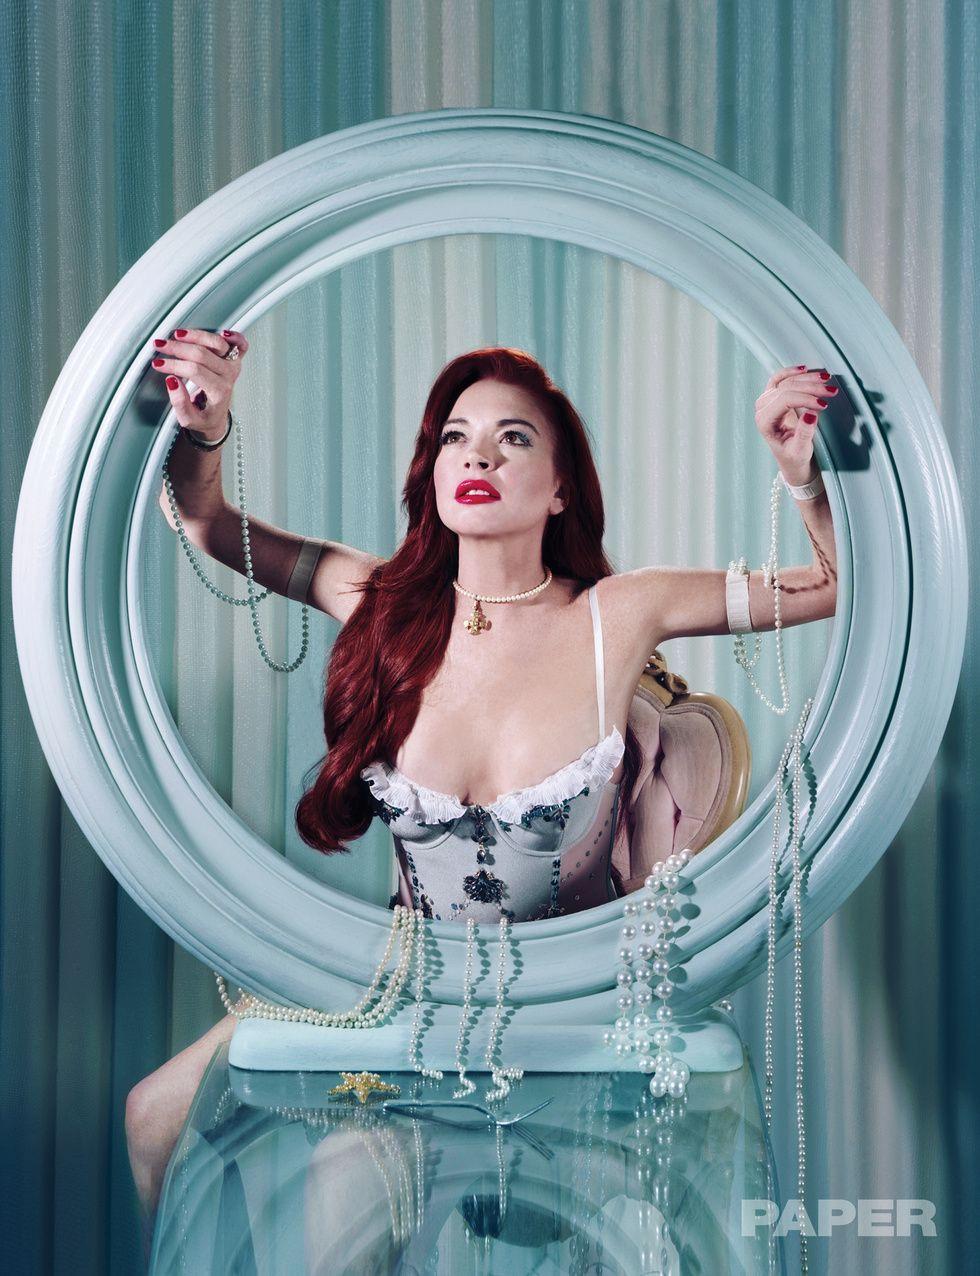 Lindsay Lohan Disney prensesi oldu! - Sayfa 4